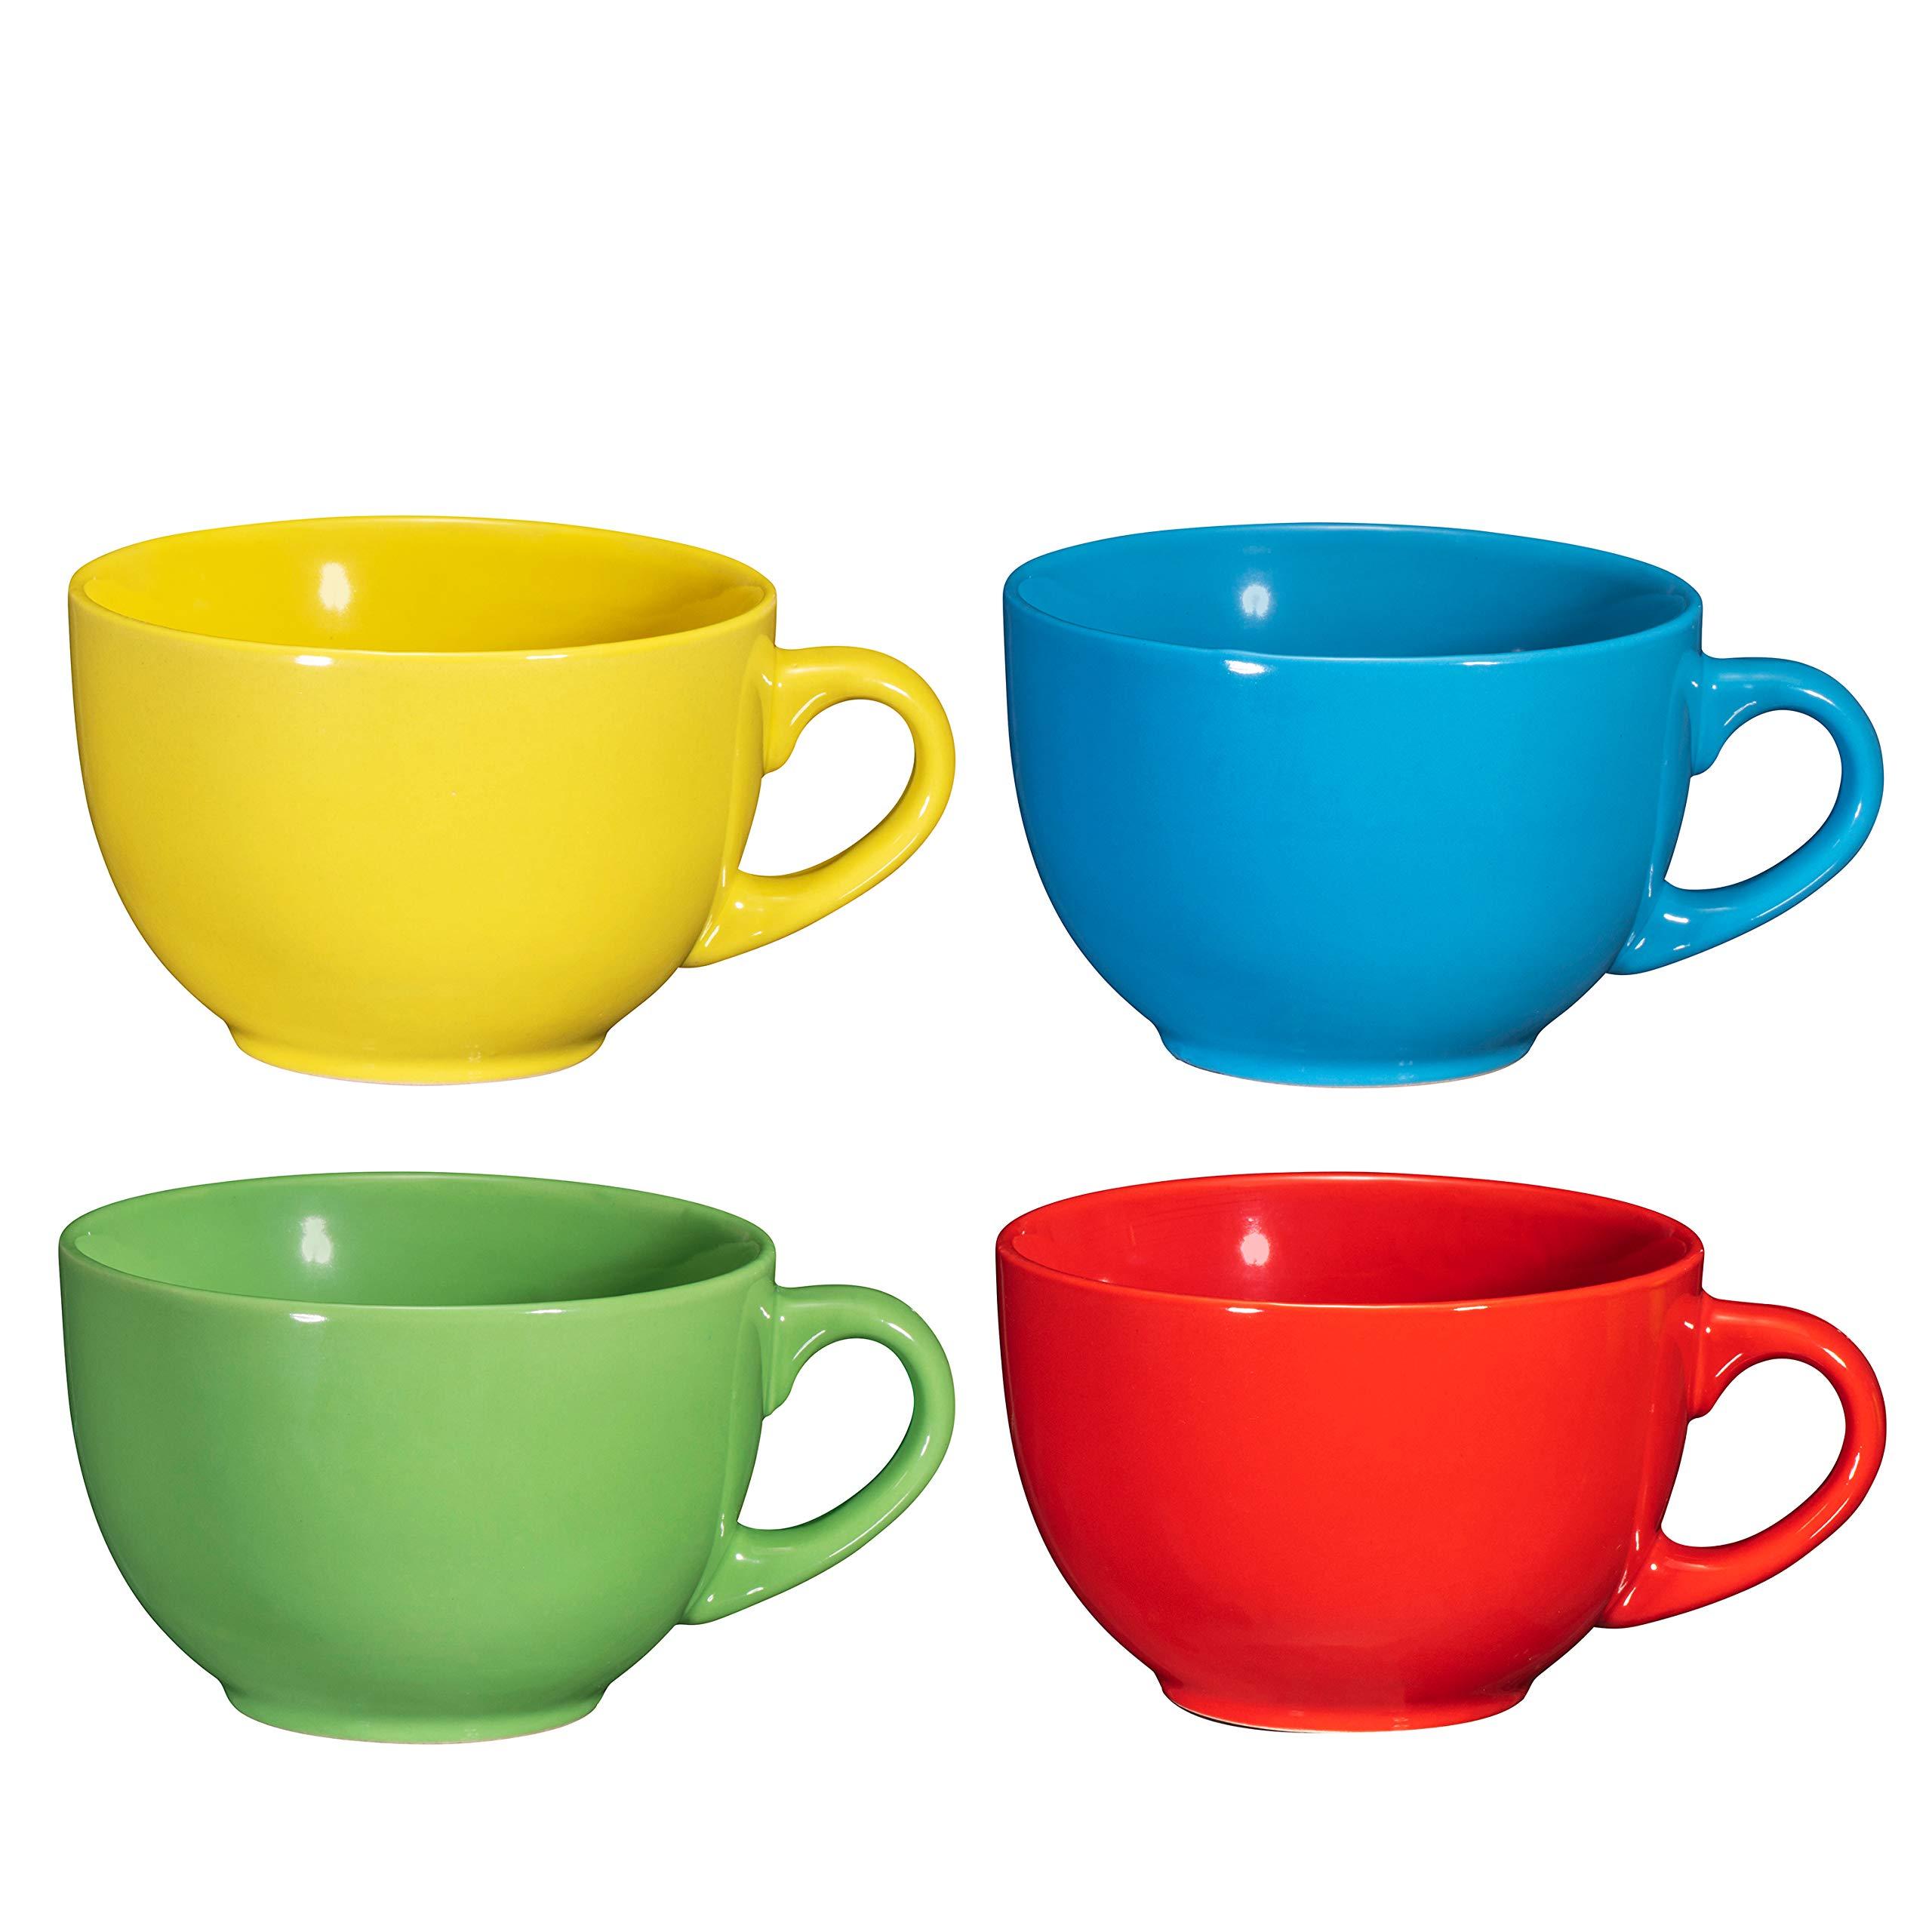 Wide Ceramic Mug Set of 4, 24 Ounce, By Bruntmor (Multi-Color)